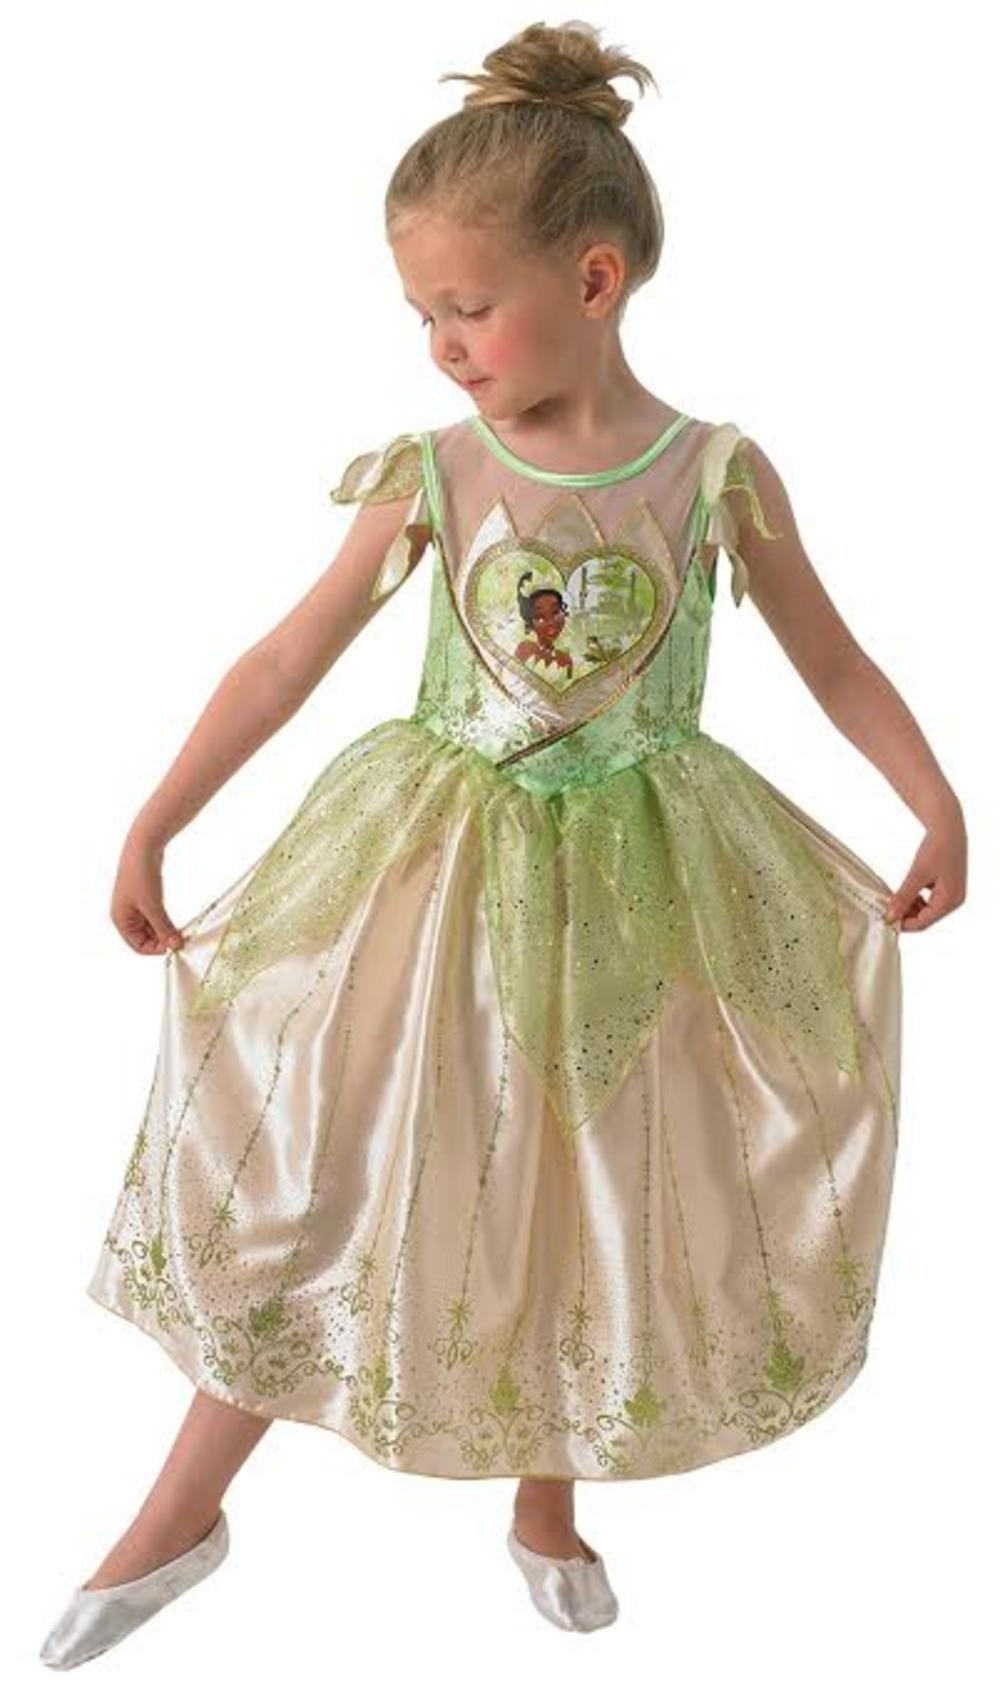 Loveheart Tiana Costume